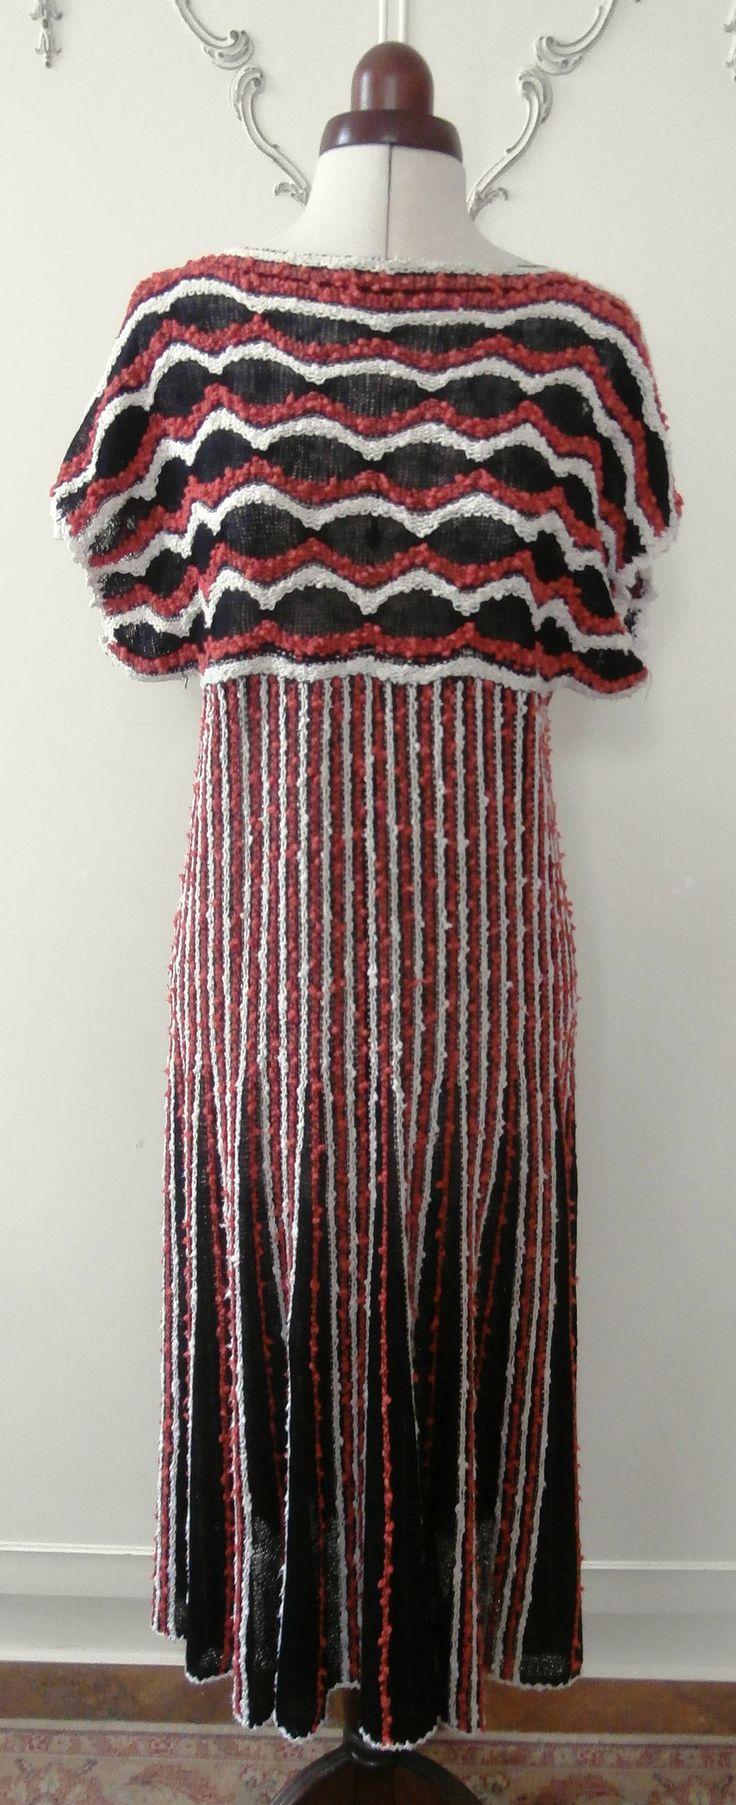 Vintage 1970's Natural Fibre Black, Red & White Knitted Midi-Dress UK Size 10-12 by SBDVintage on Etsy